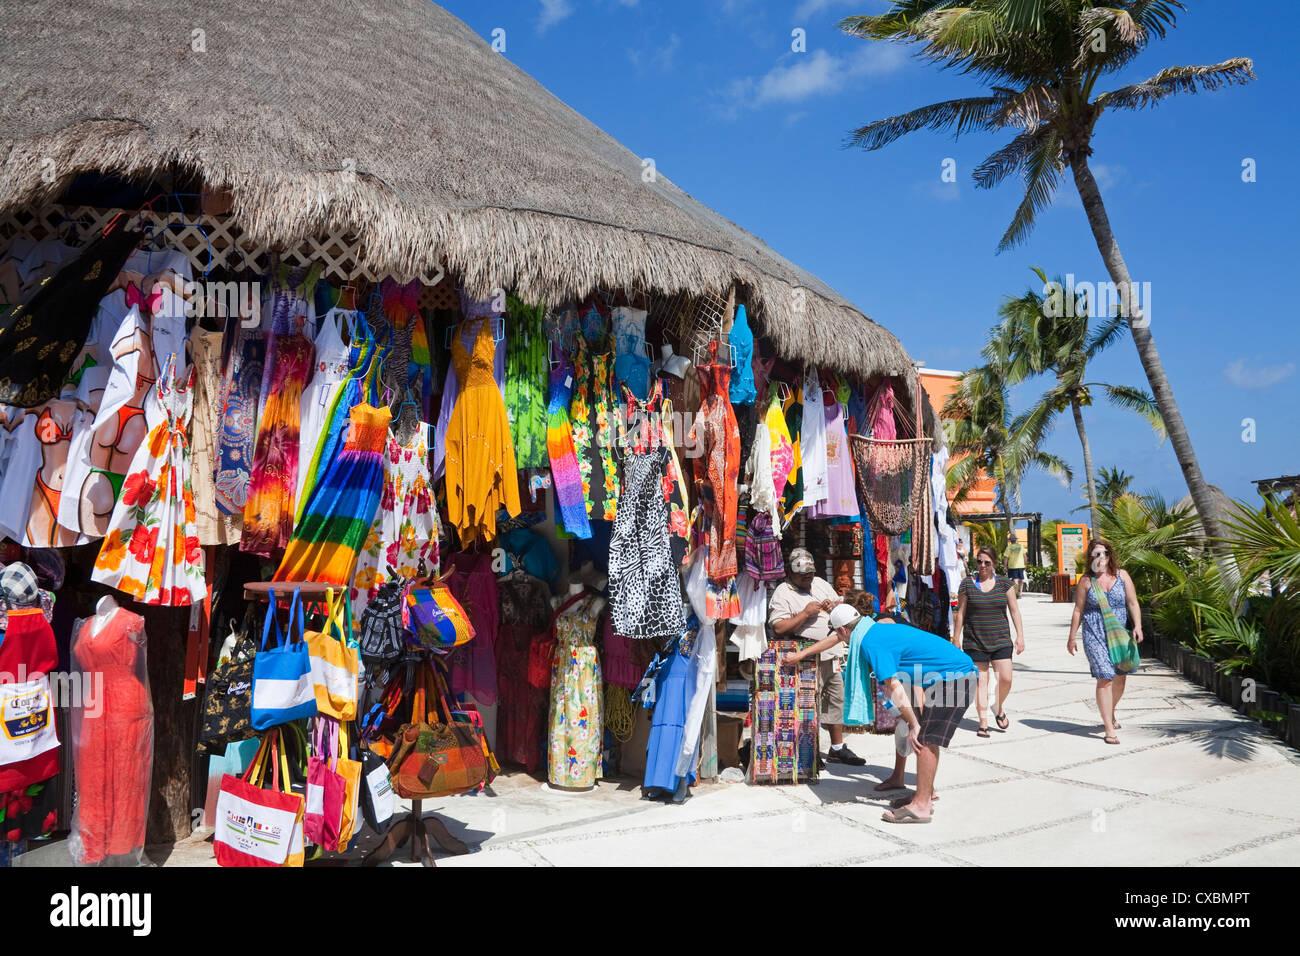 Store in Costa Maya port, Quintana Roo, Mexico, North America - Stock Image